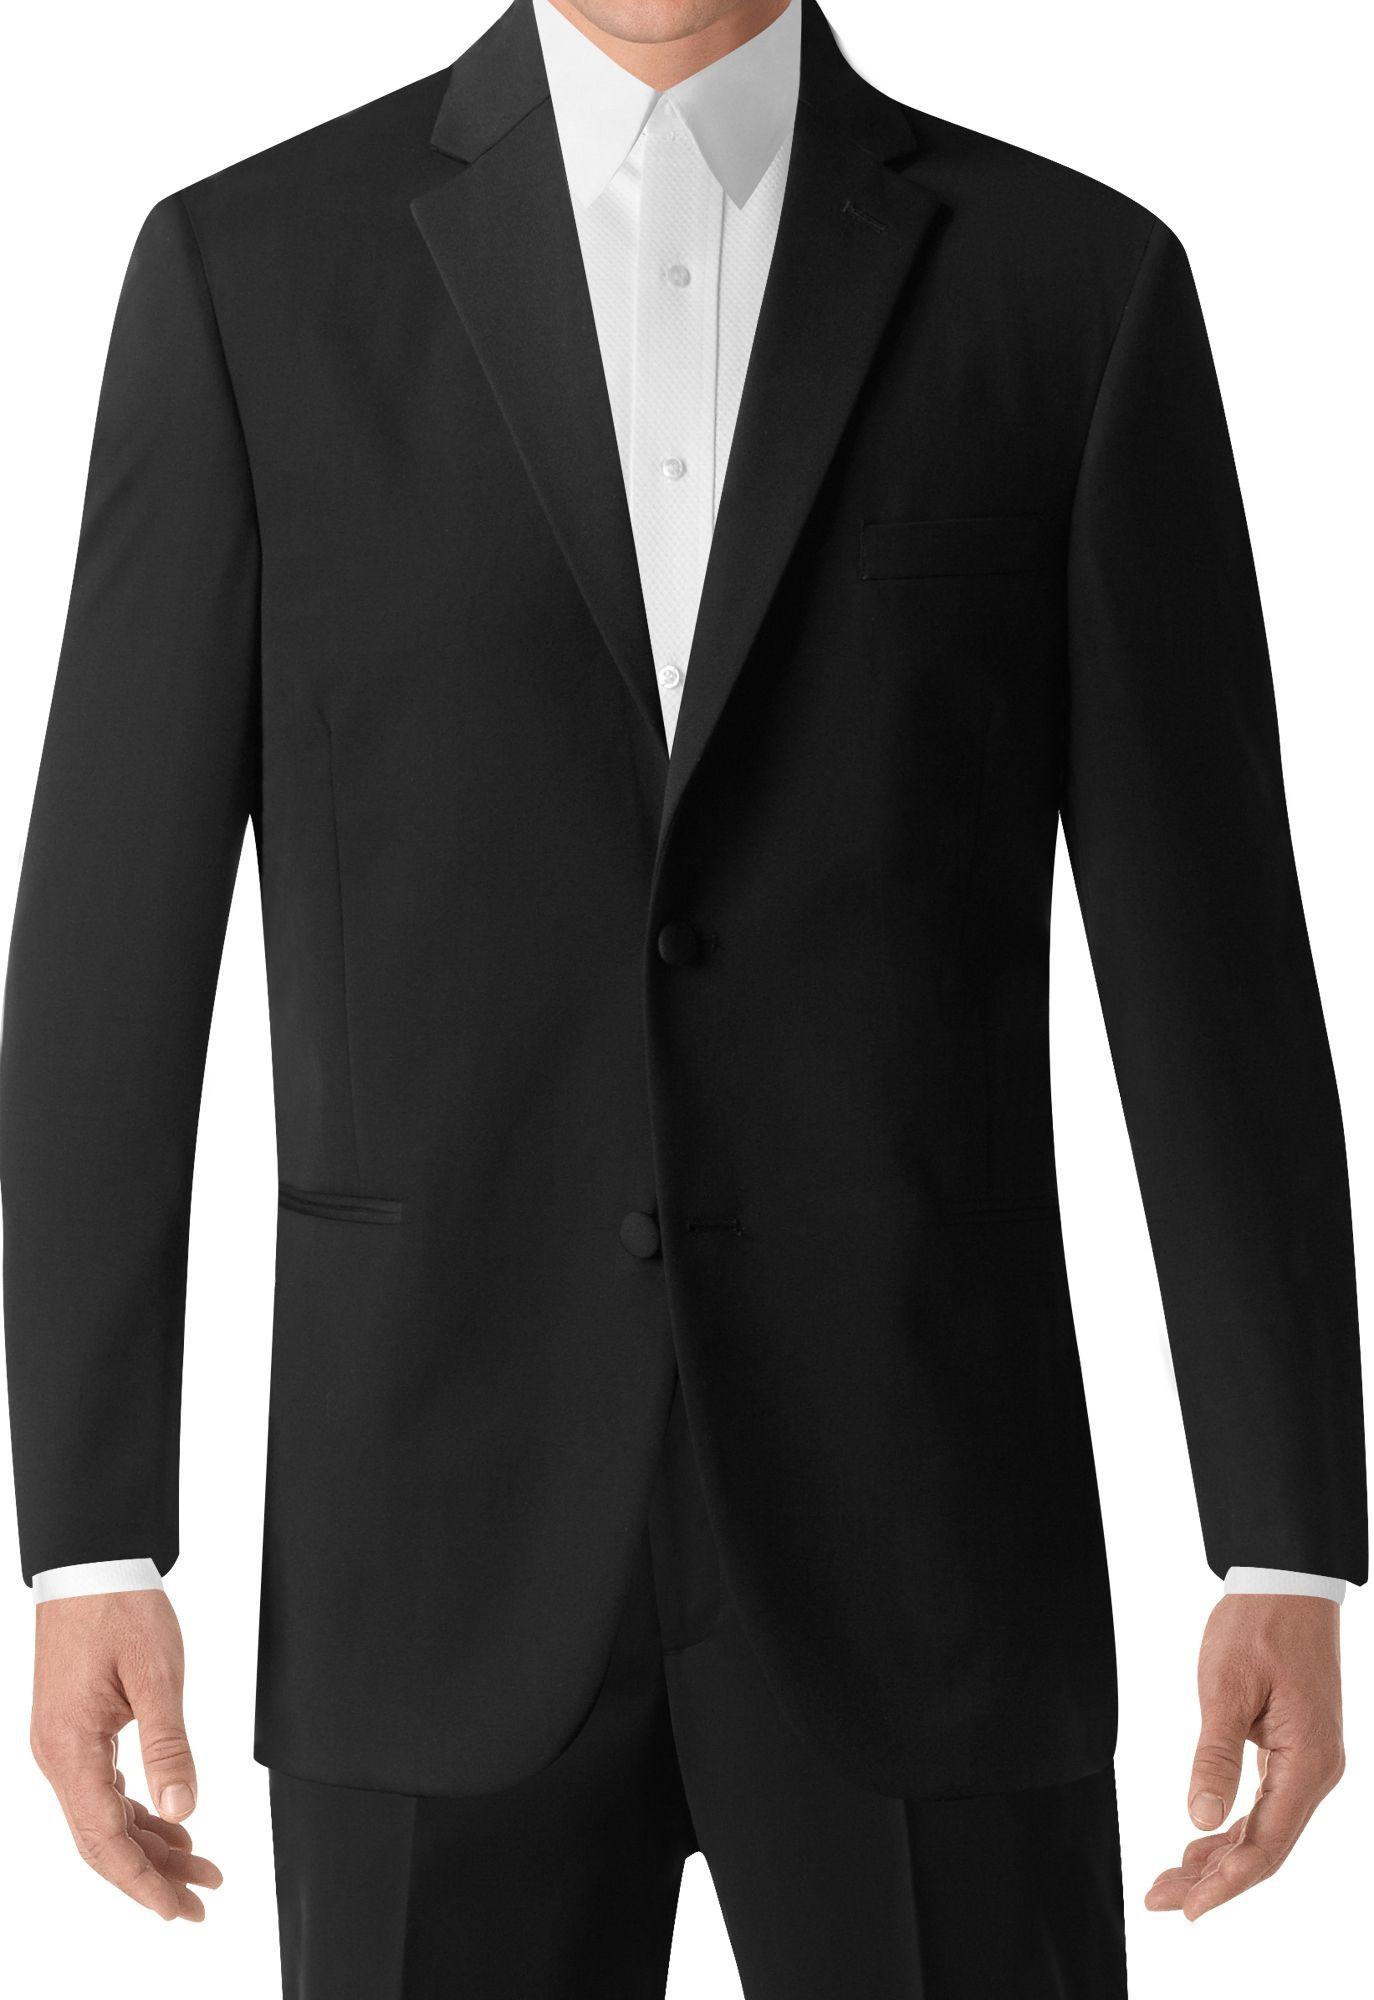 At Generation Tux, we believe your entire black tie